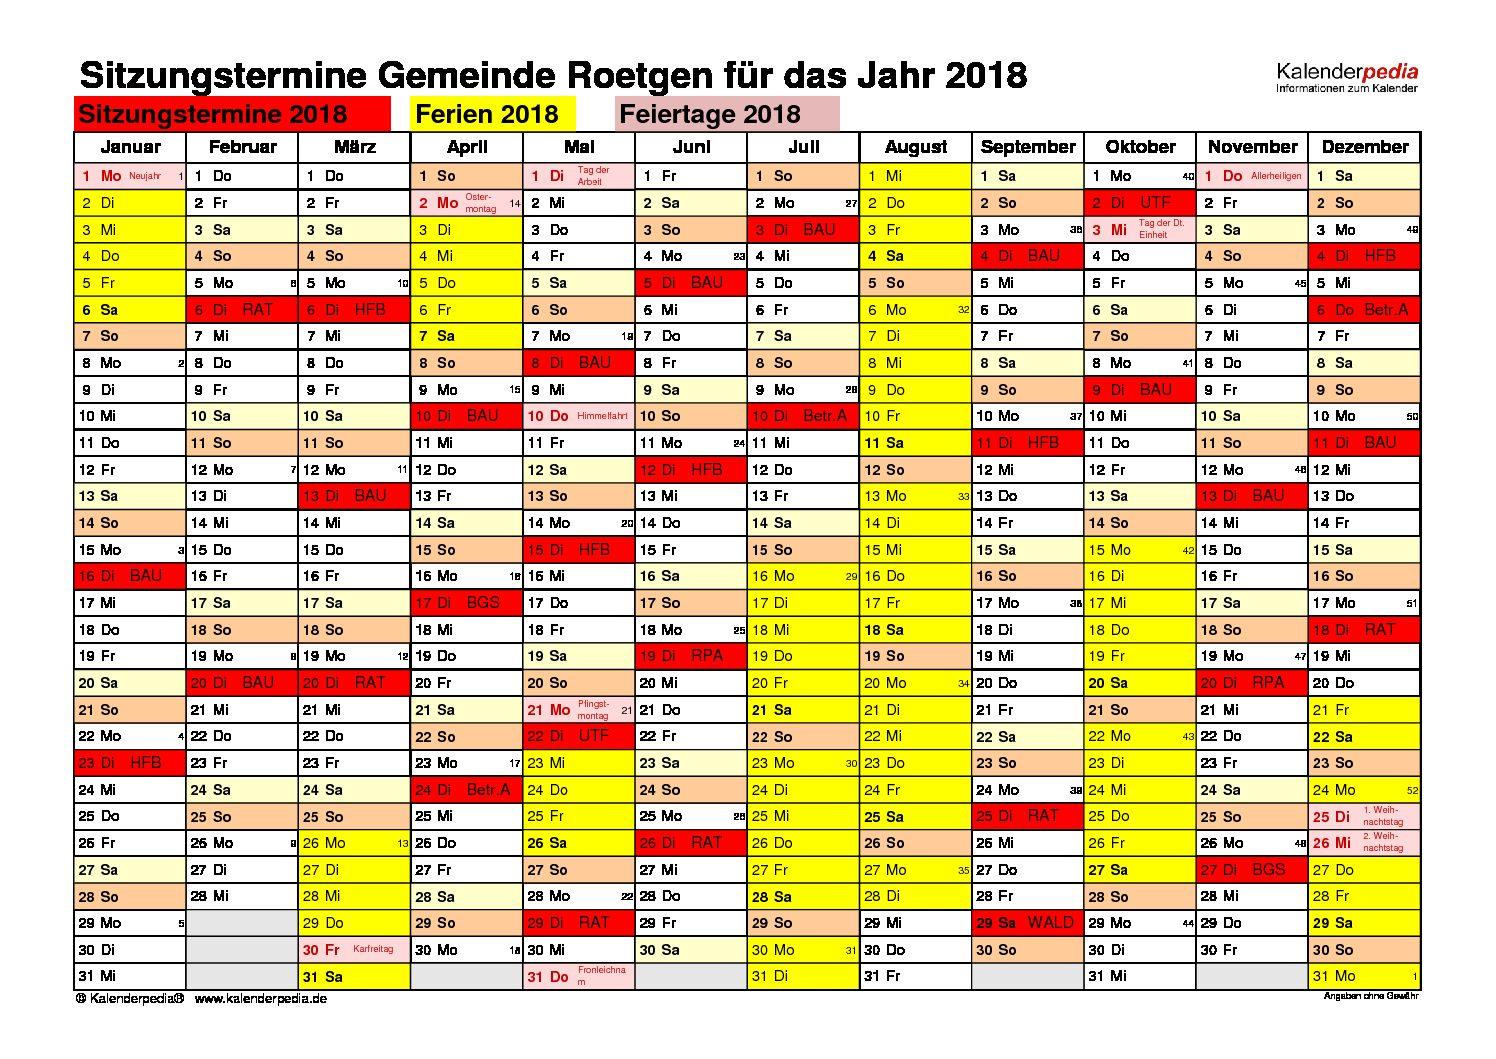 KalenderSitzung2018